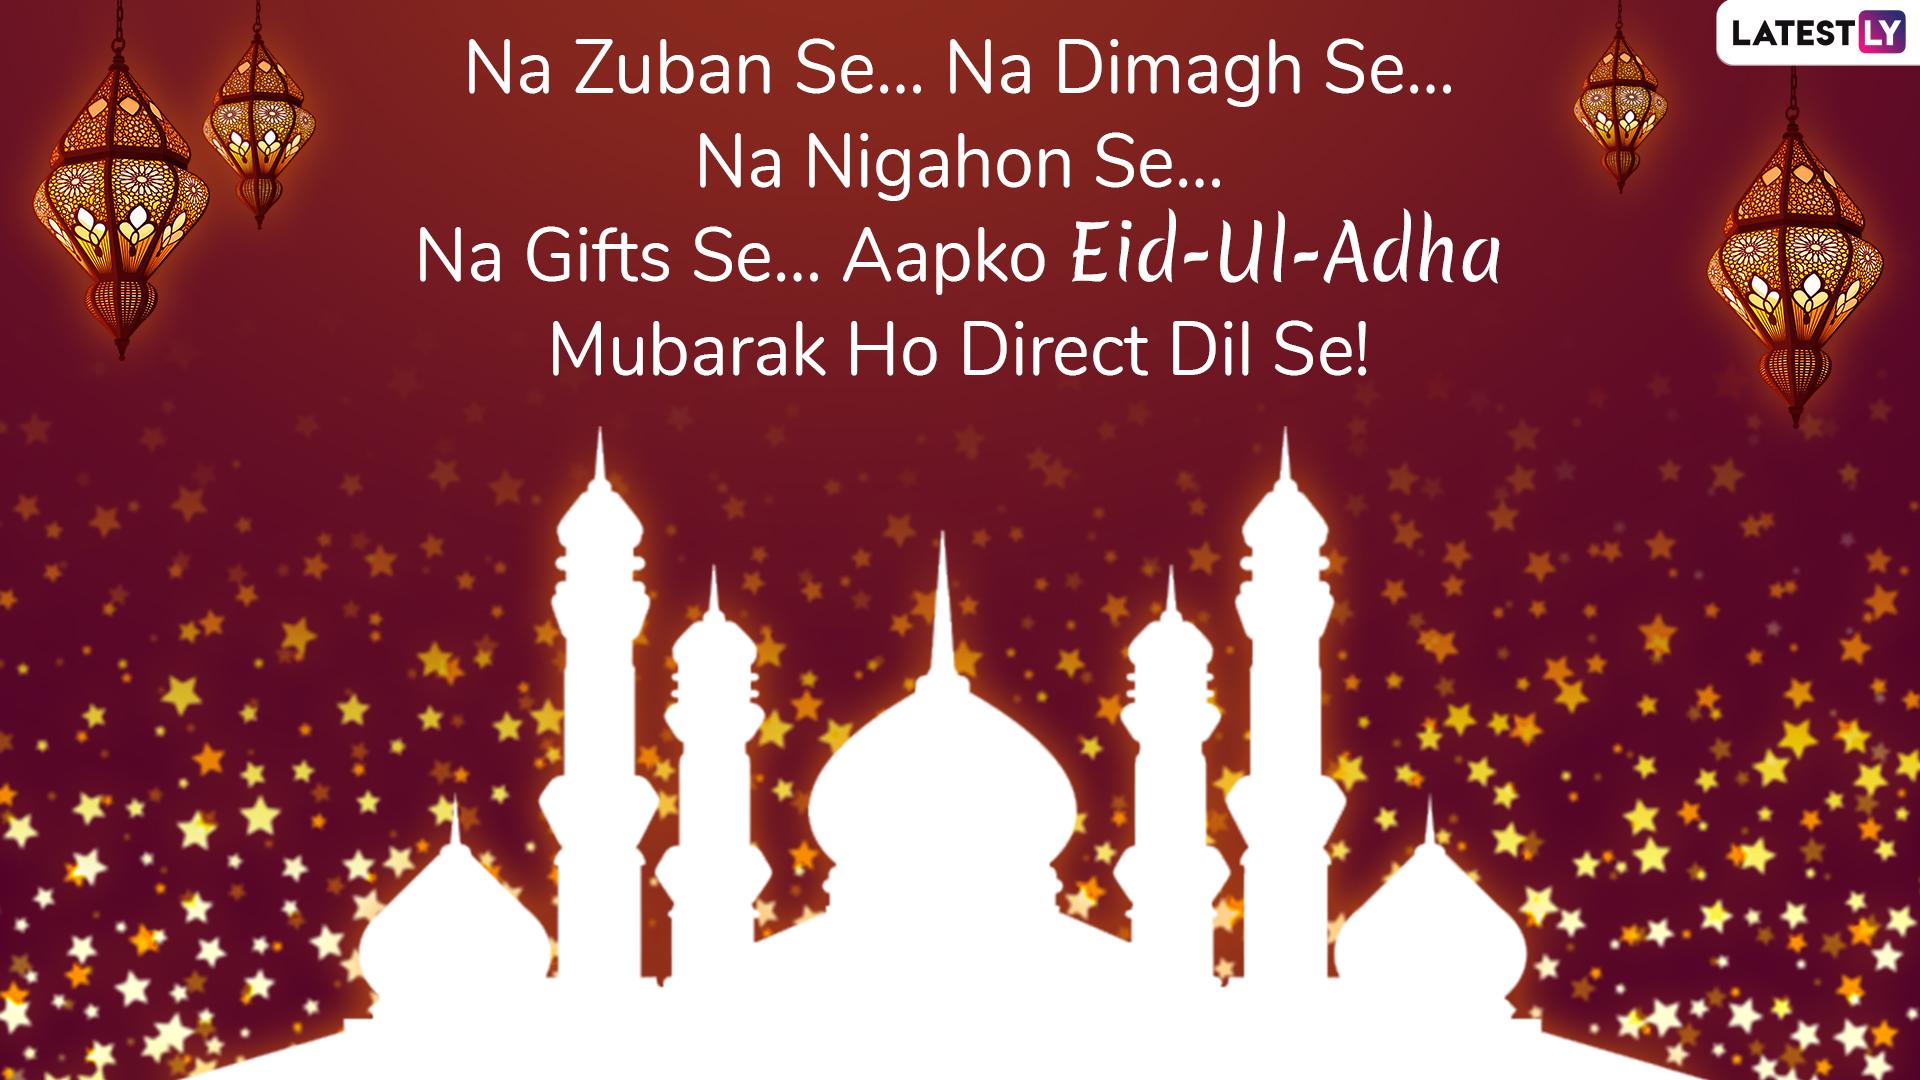 Eid Al-Adha 2019 Messages In Hindi: Bakra Eid Mubarak